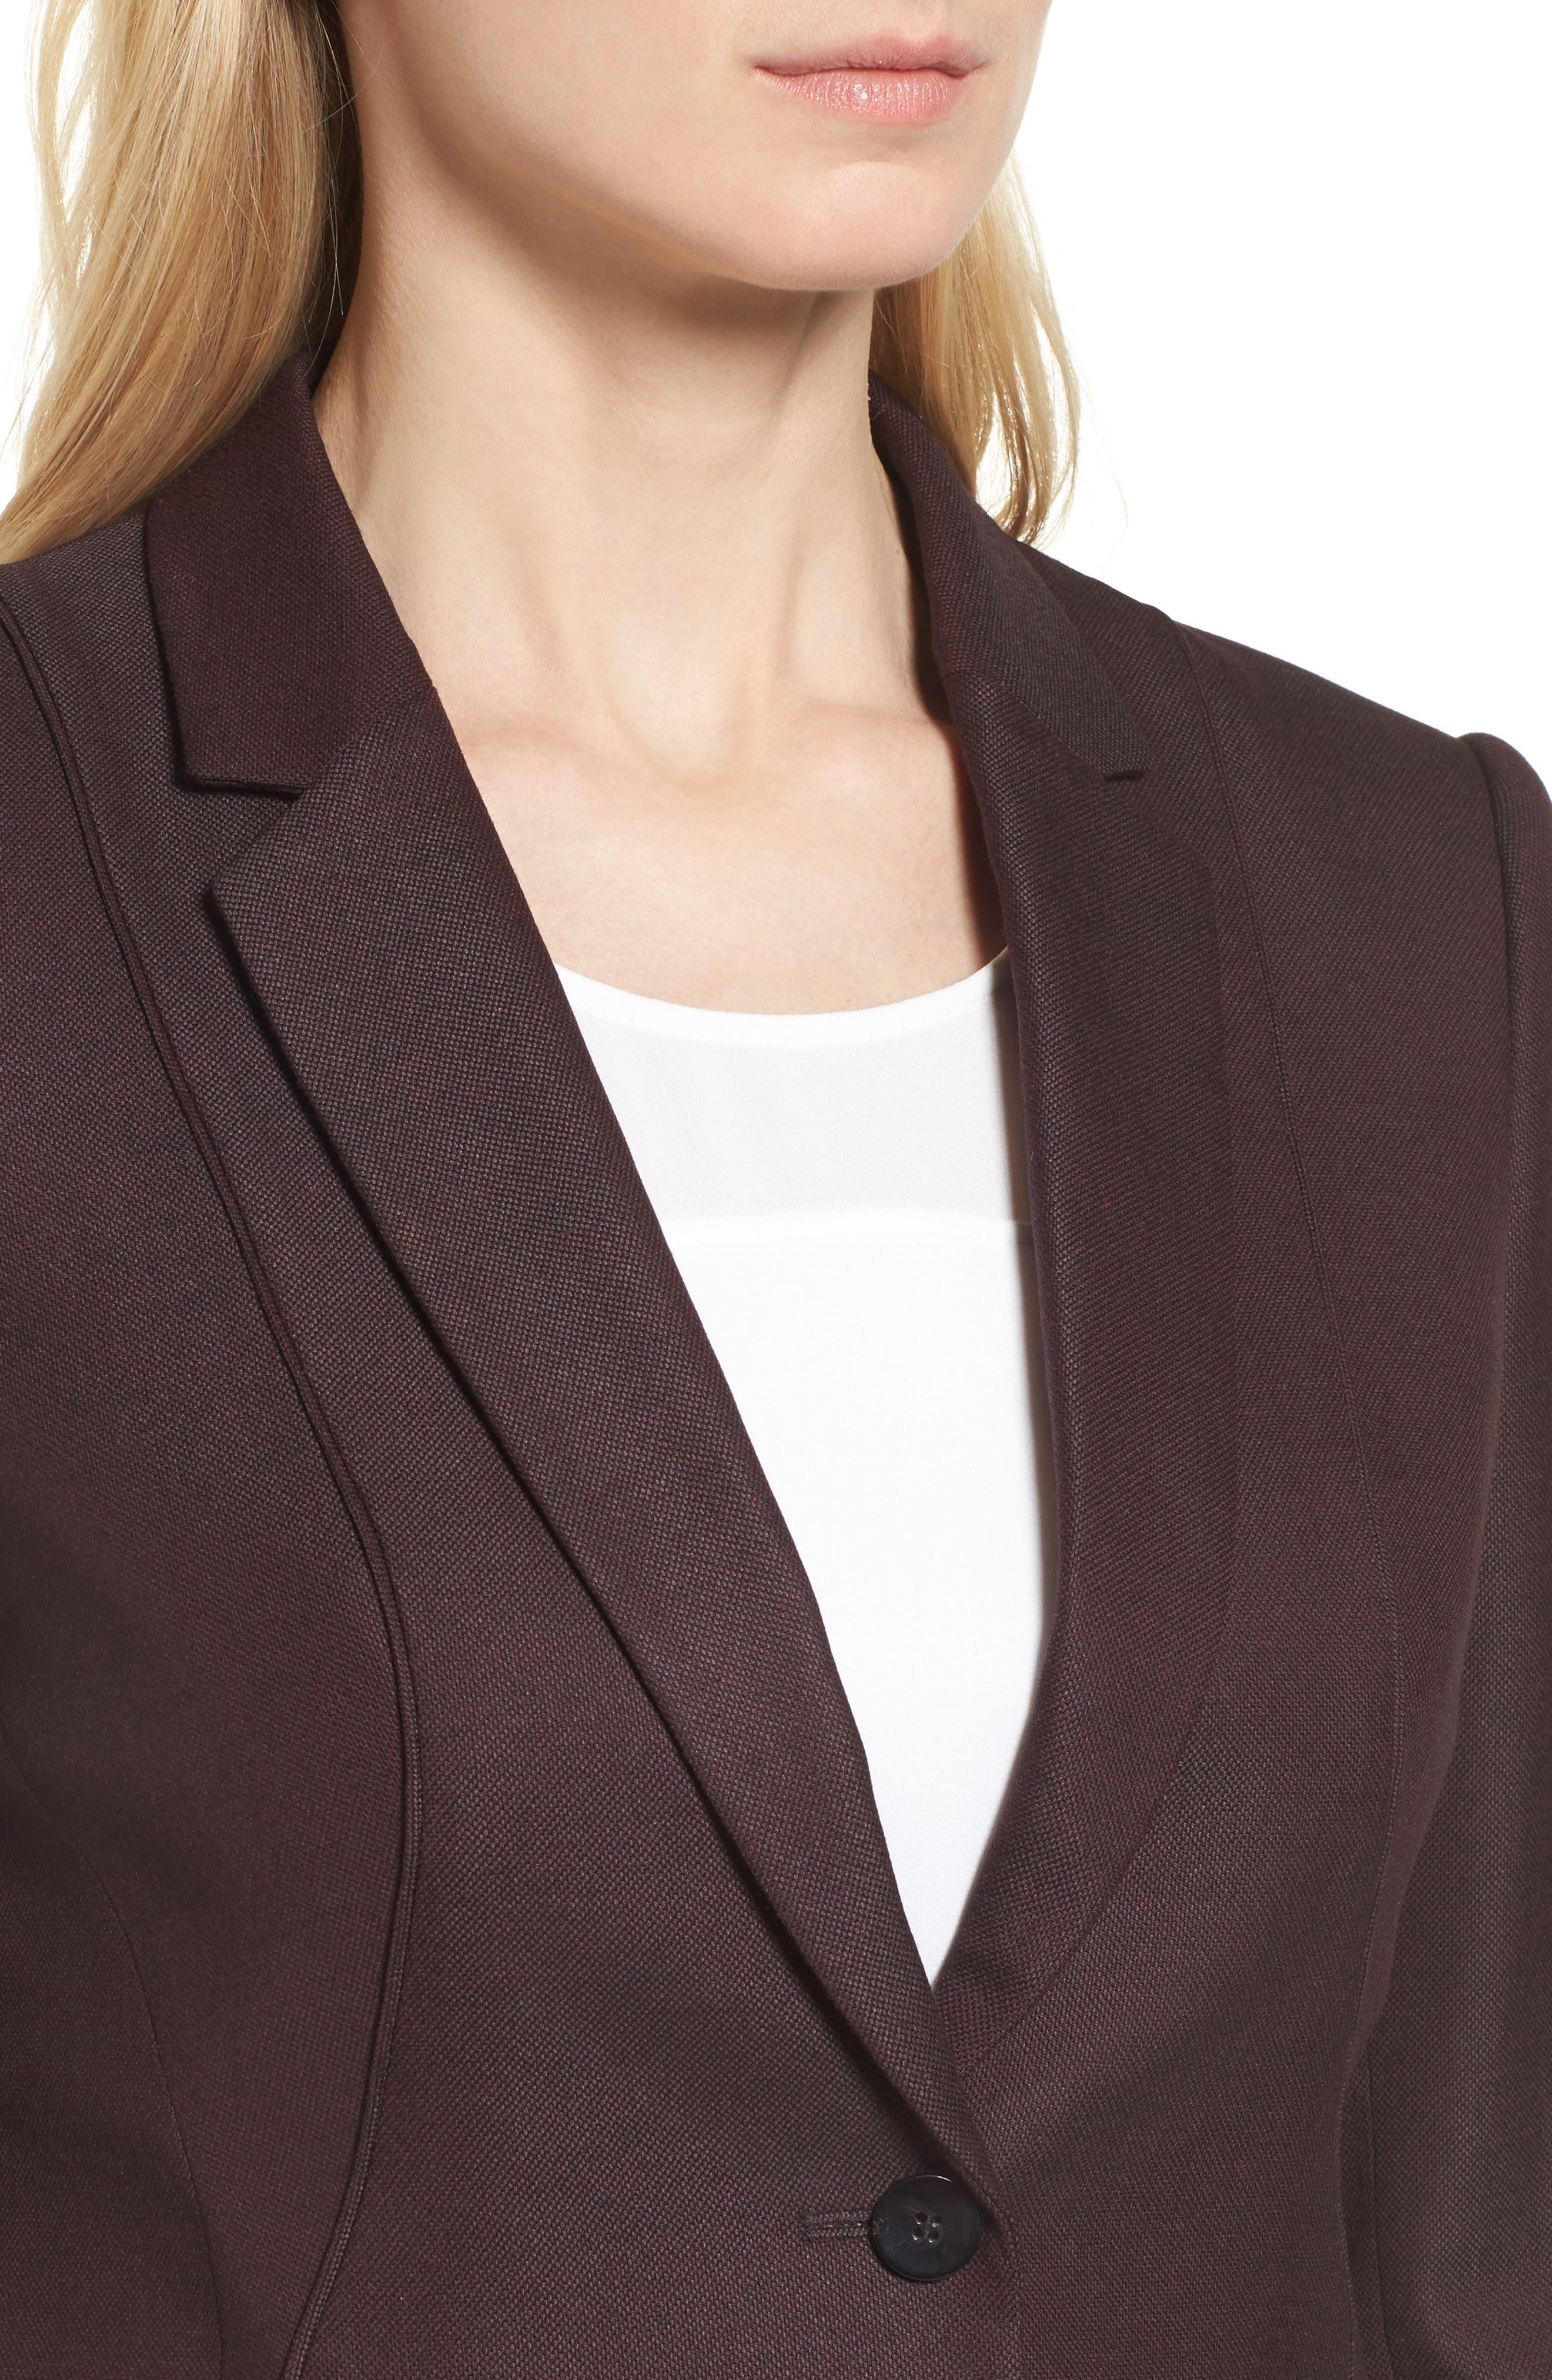 Jenesa Suit Jacket,                             Alternate thumbnail 4, color,